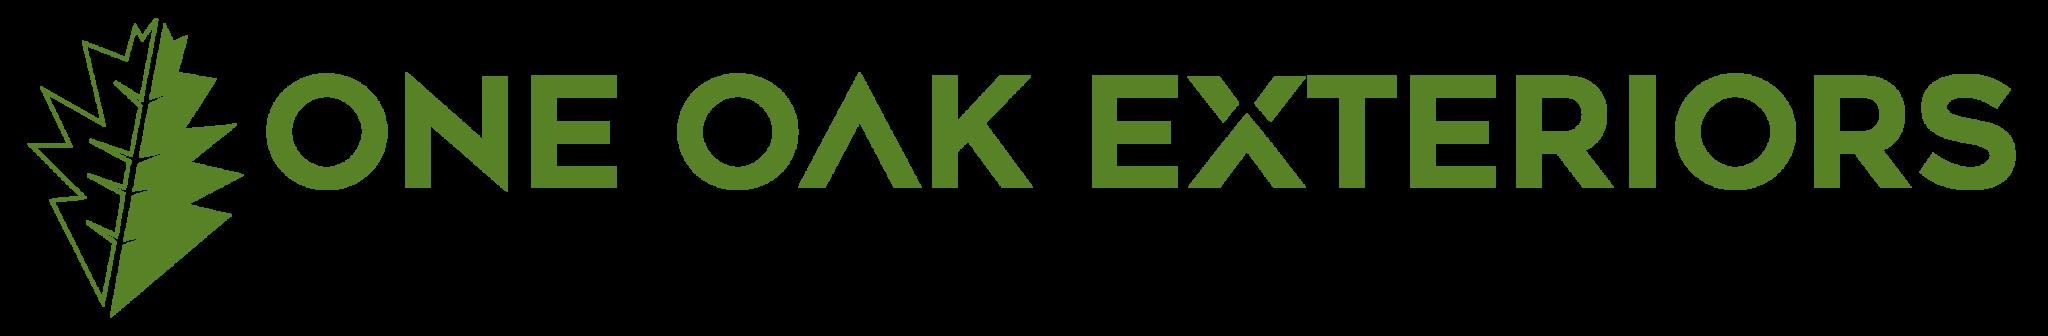 One Oak Exteriors